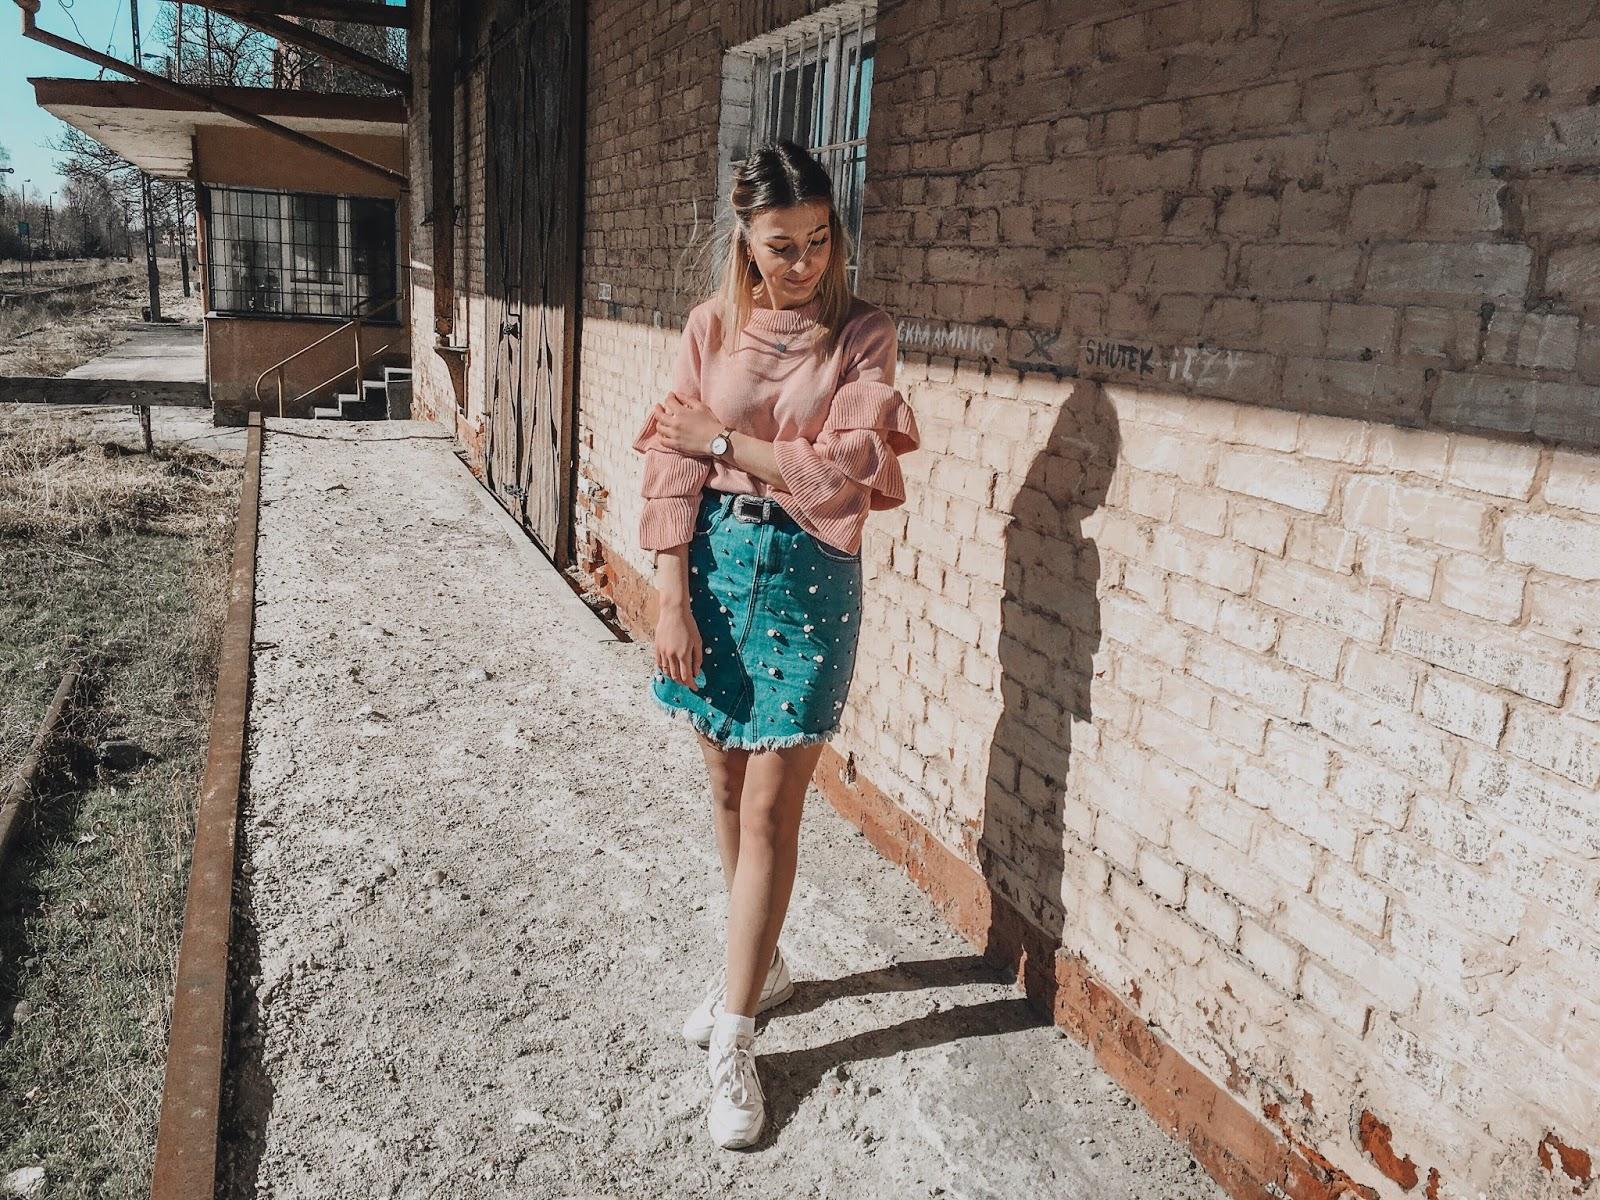 SPÓDNICA ZDOBIONA PEREŁKAMI | paulyenn style